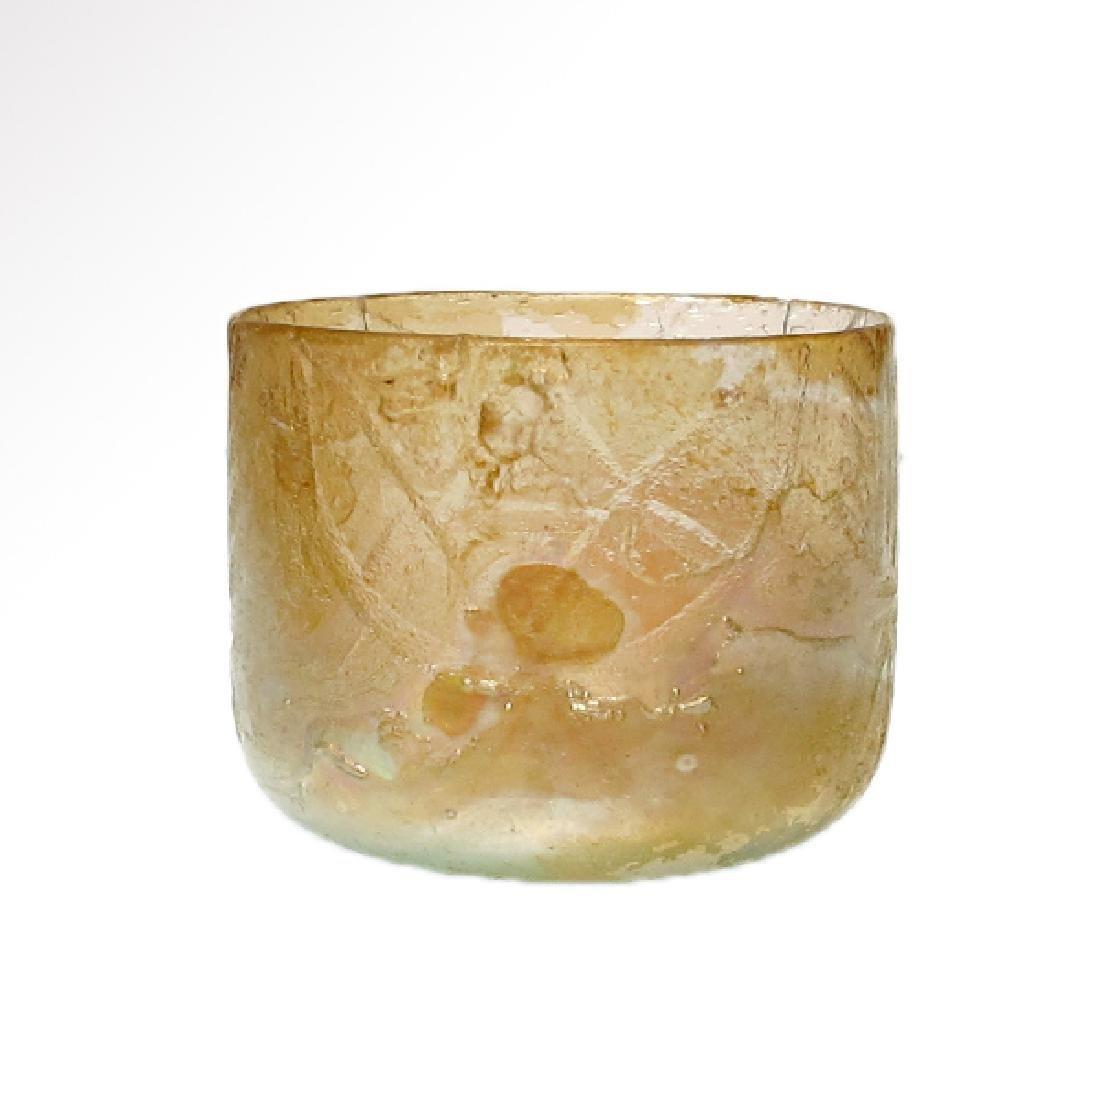 Roman Egyptian Cut Glass Beaker with Lotus - 2